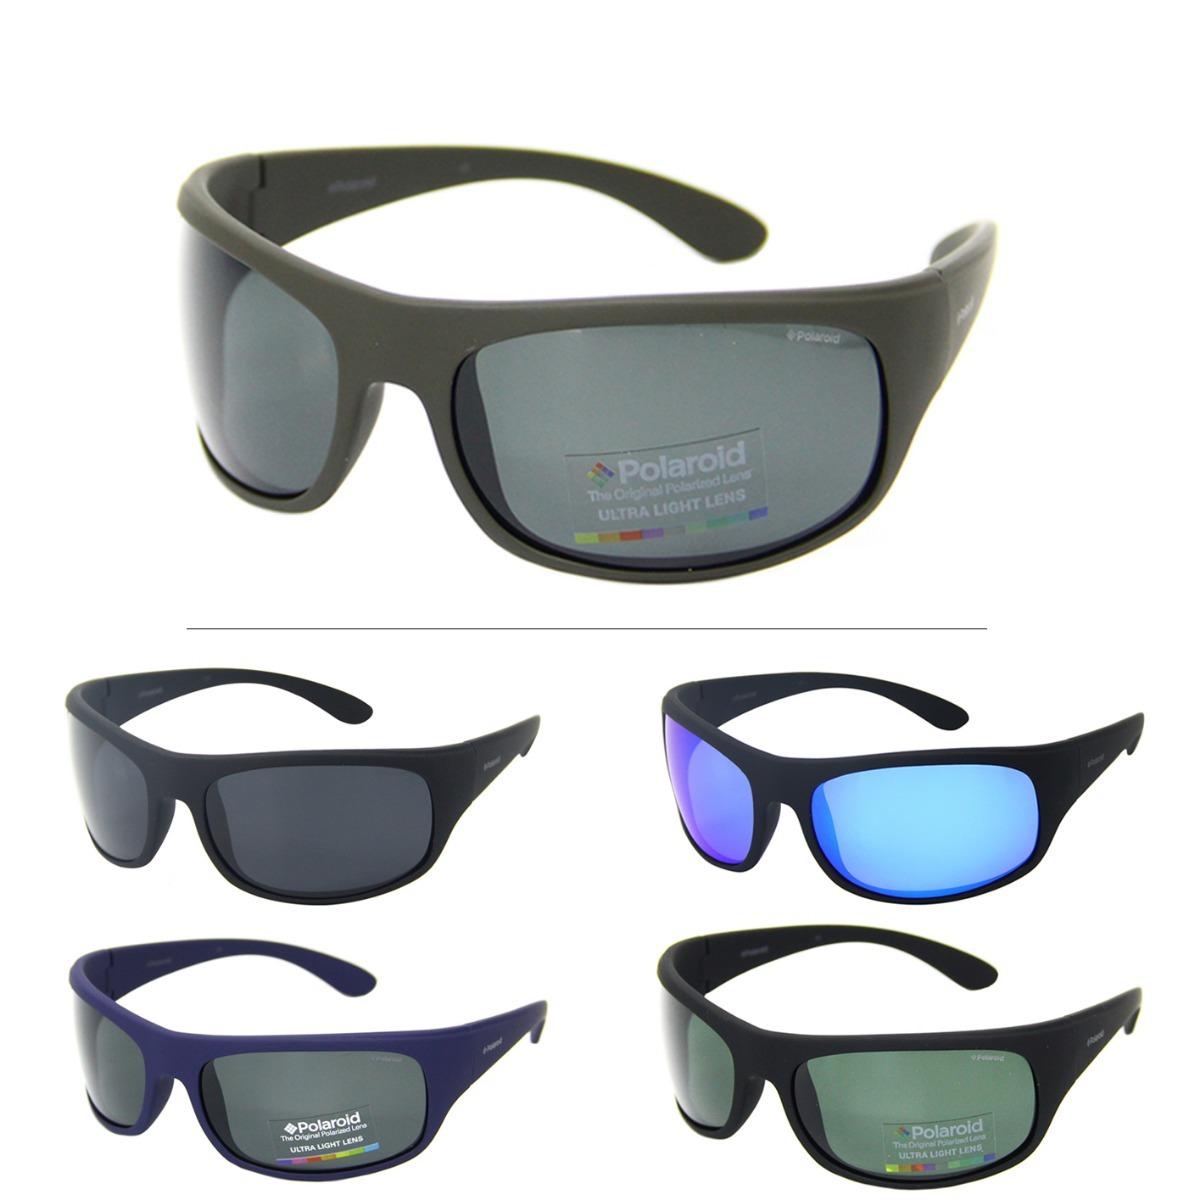 Óculos Solar Masculino Polaroid 7886 Flexível - Original - R  179,45 ... 5850691037